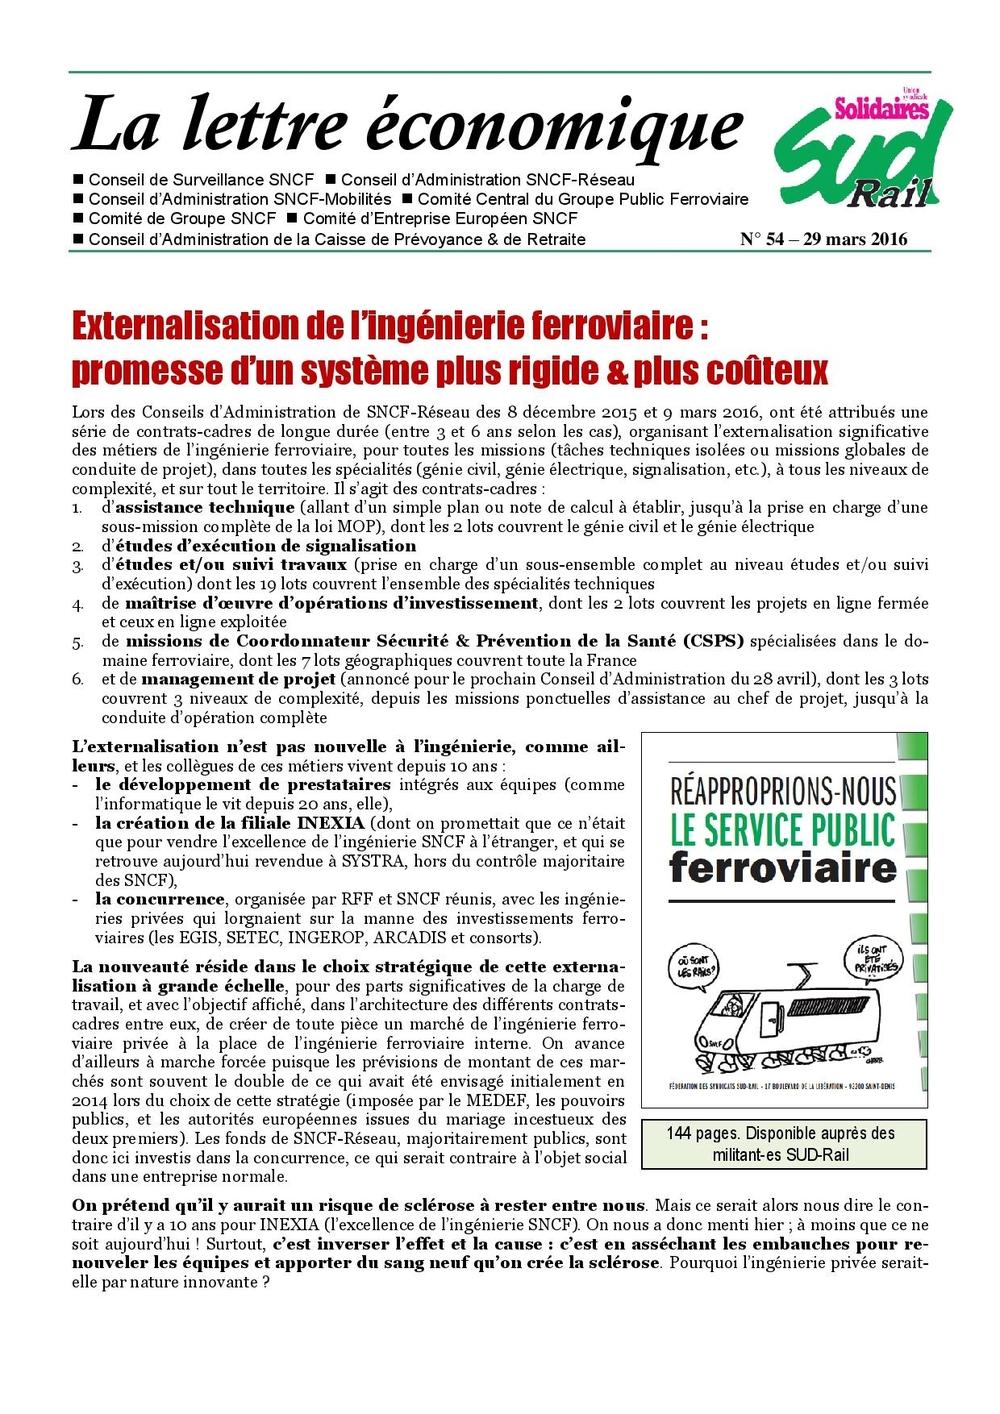 LETTRE ECO 54-2016 03 29-page-001